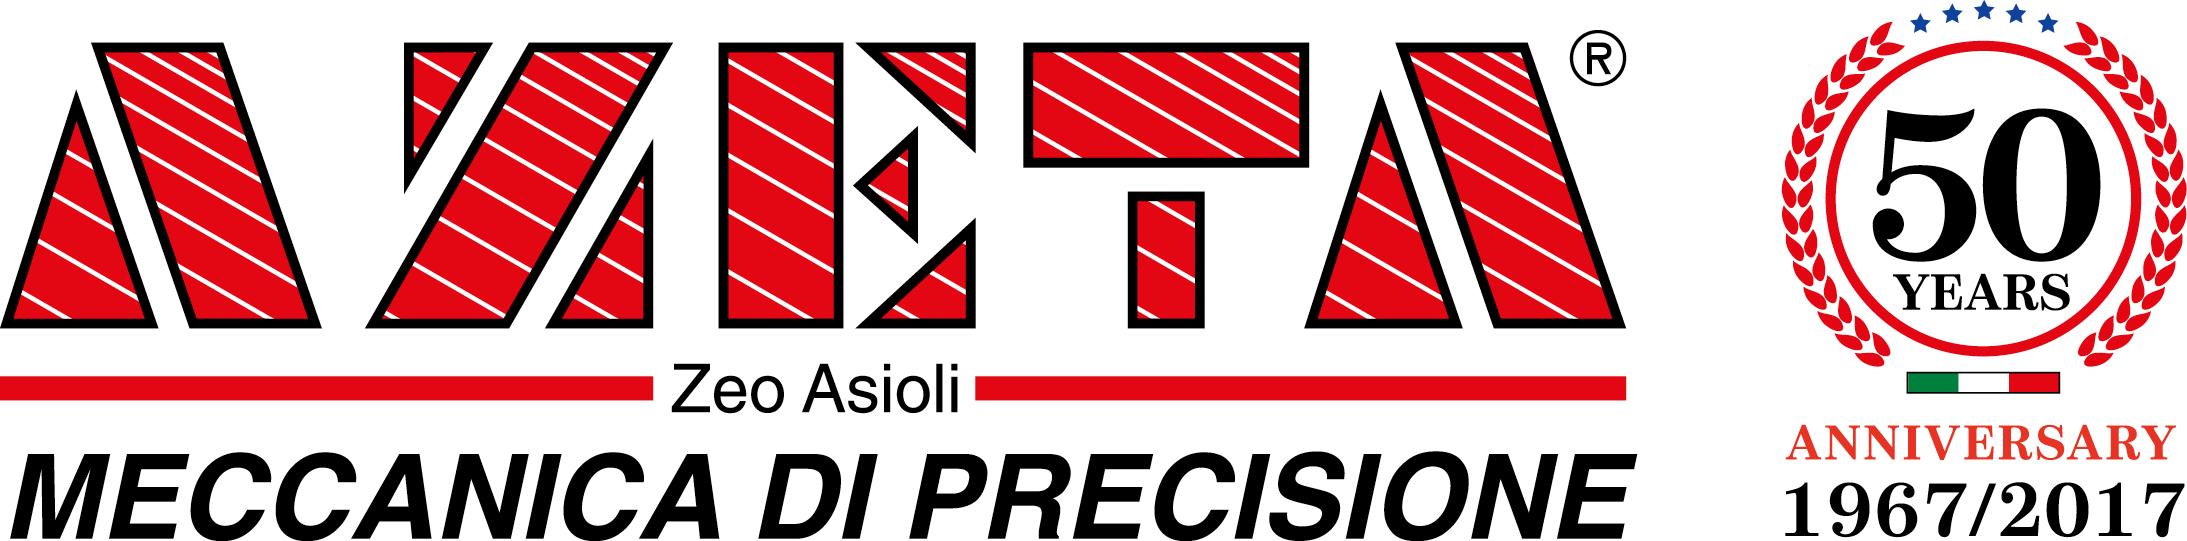 Azeta Zeo Asioli Diffusion srl